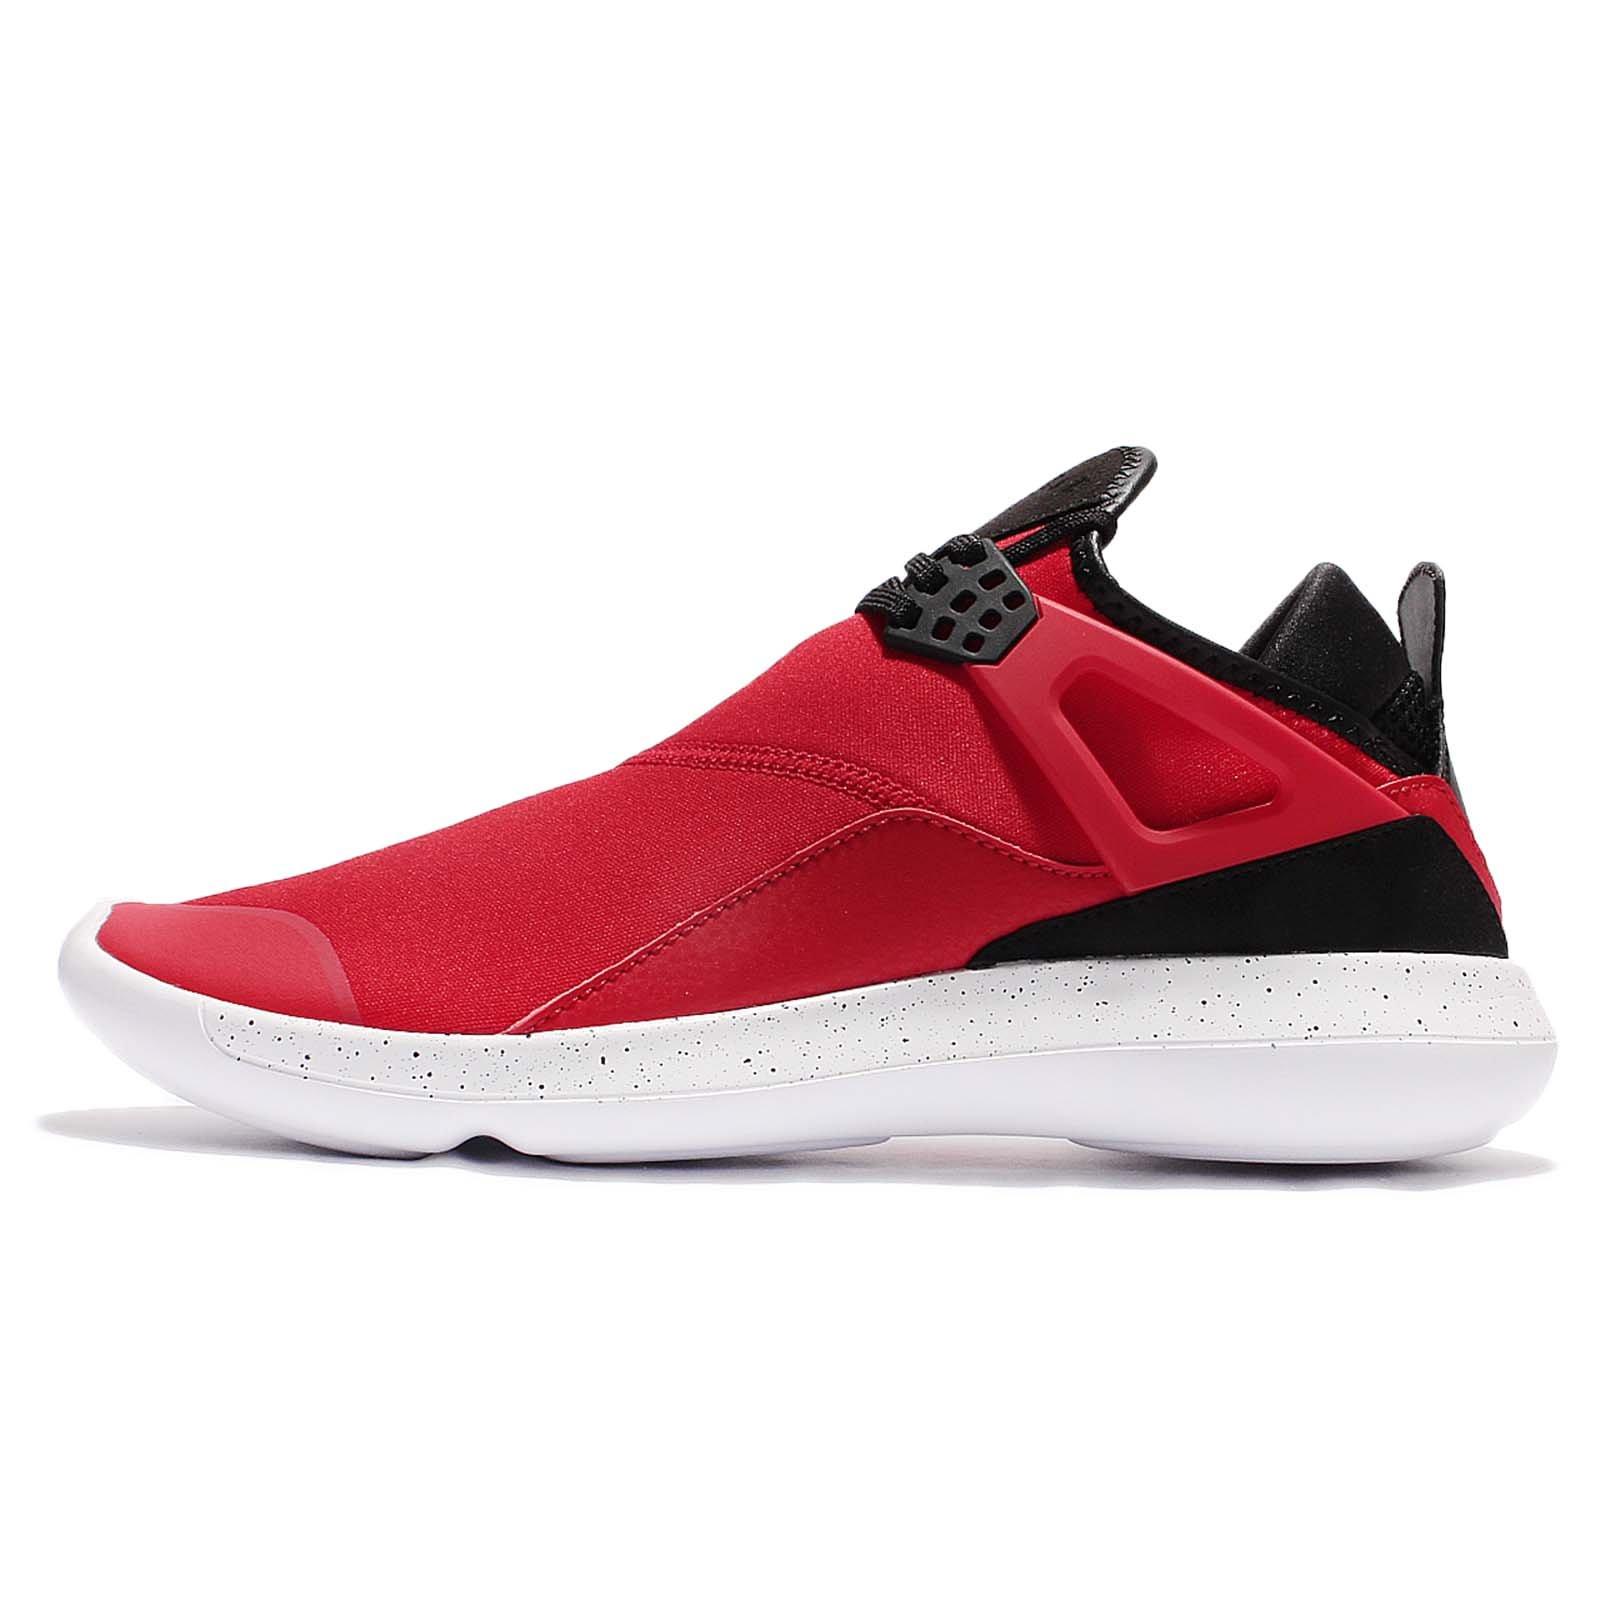 ff99de84f4d93 Galleon - Nike Air Jordan Fly 89 Mens Trainers 940267 Sneakers Shoes (UK  8.5 US 9.5 EU 43